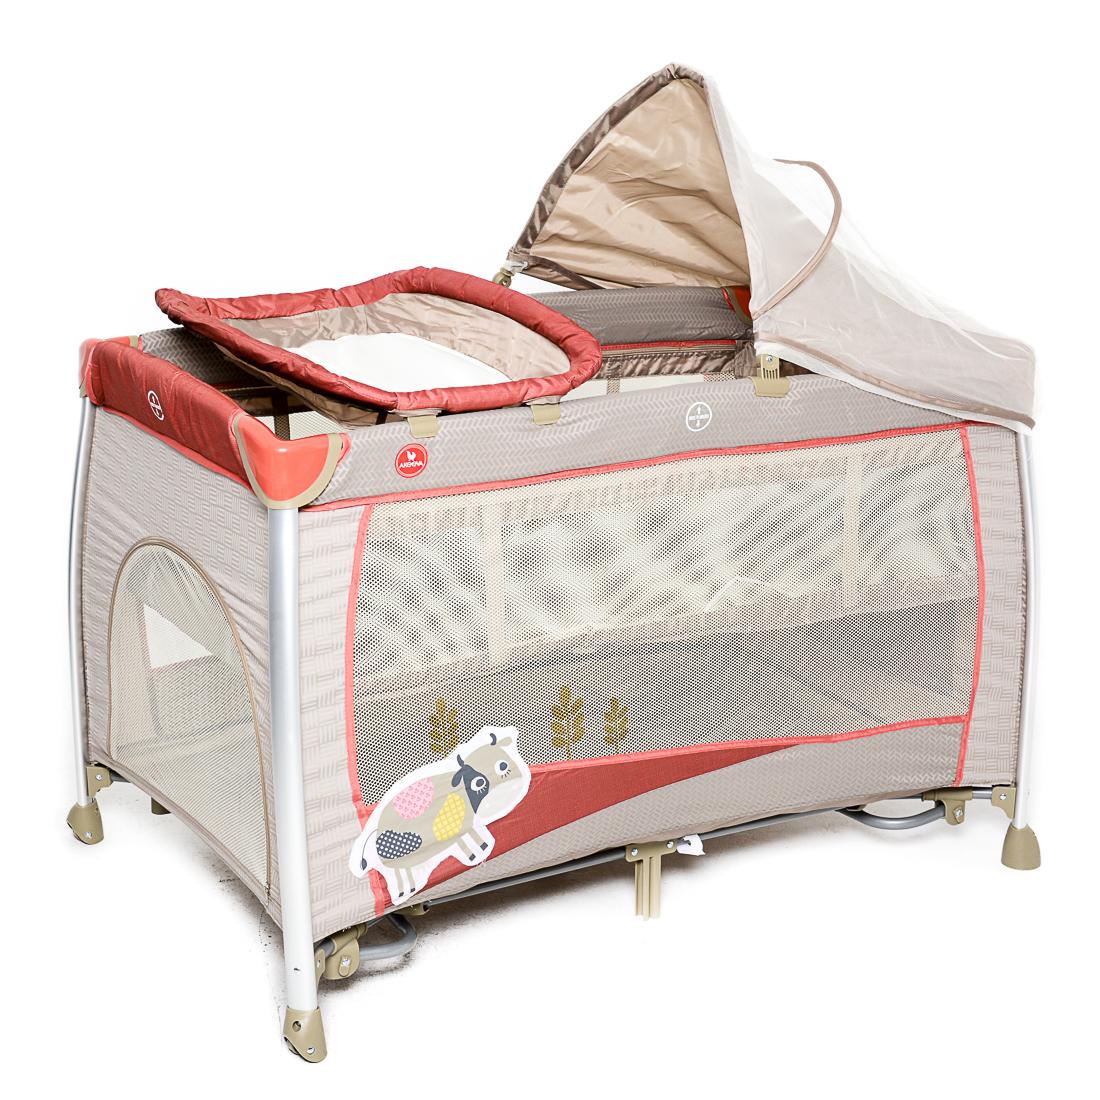 Crib for sale tarlac - Crib For Sale Tarlac 59